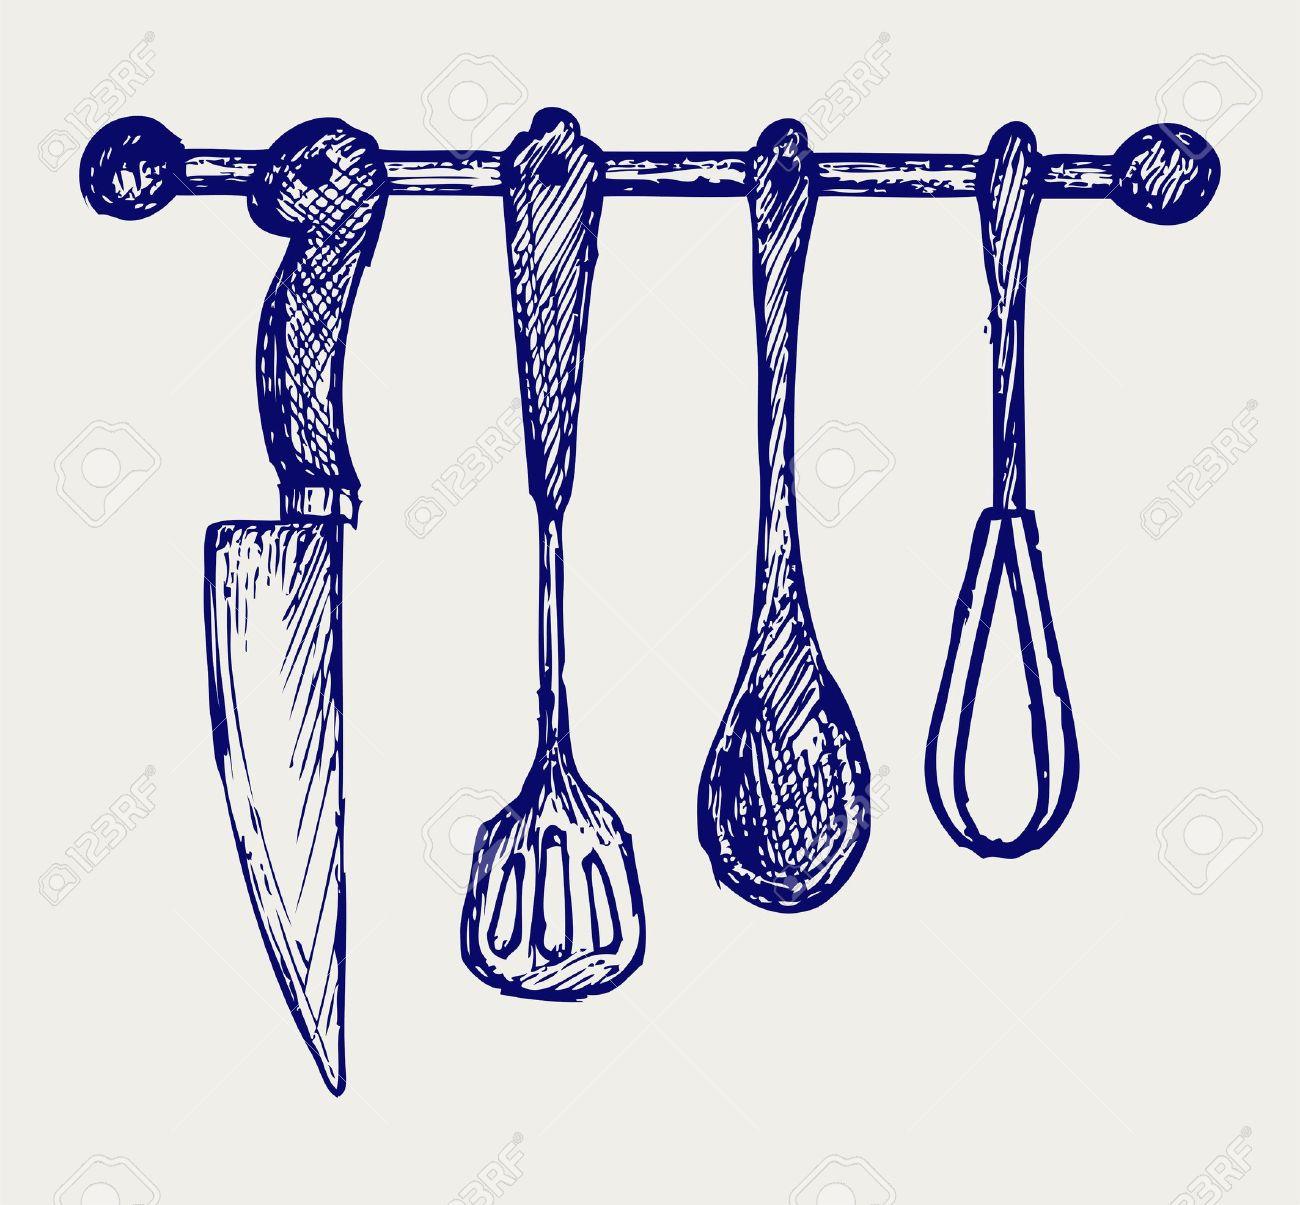 how to draw kitchen utensils